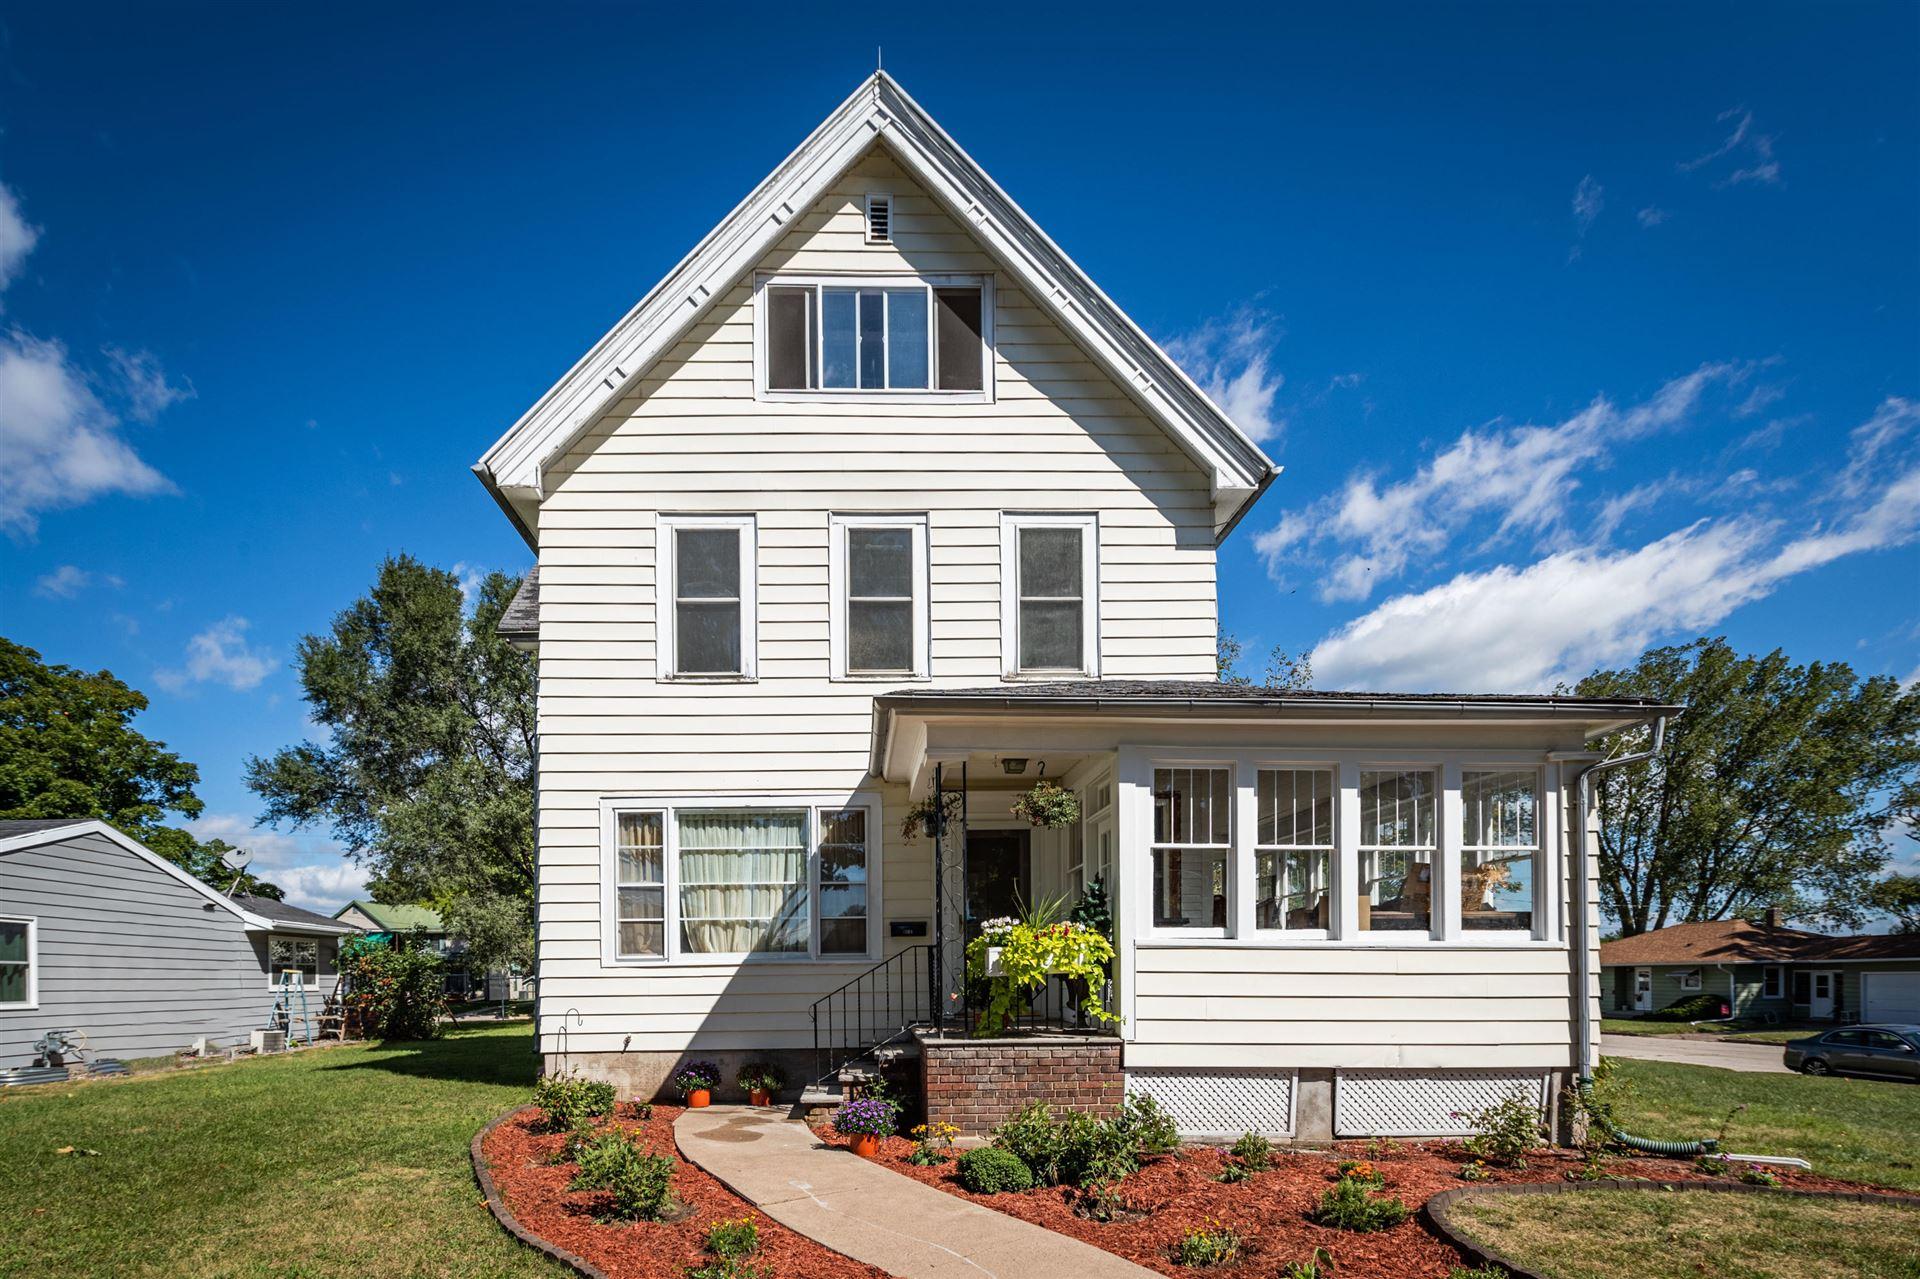 1504 Oak St, Bangor, WI 54614 - MLS#: 1708546